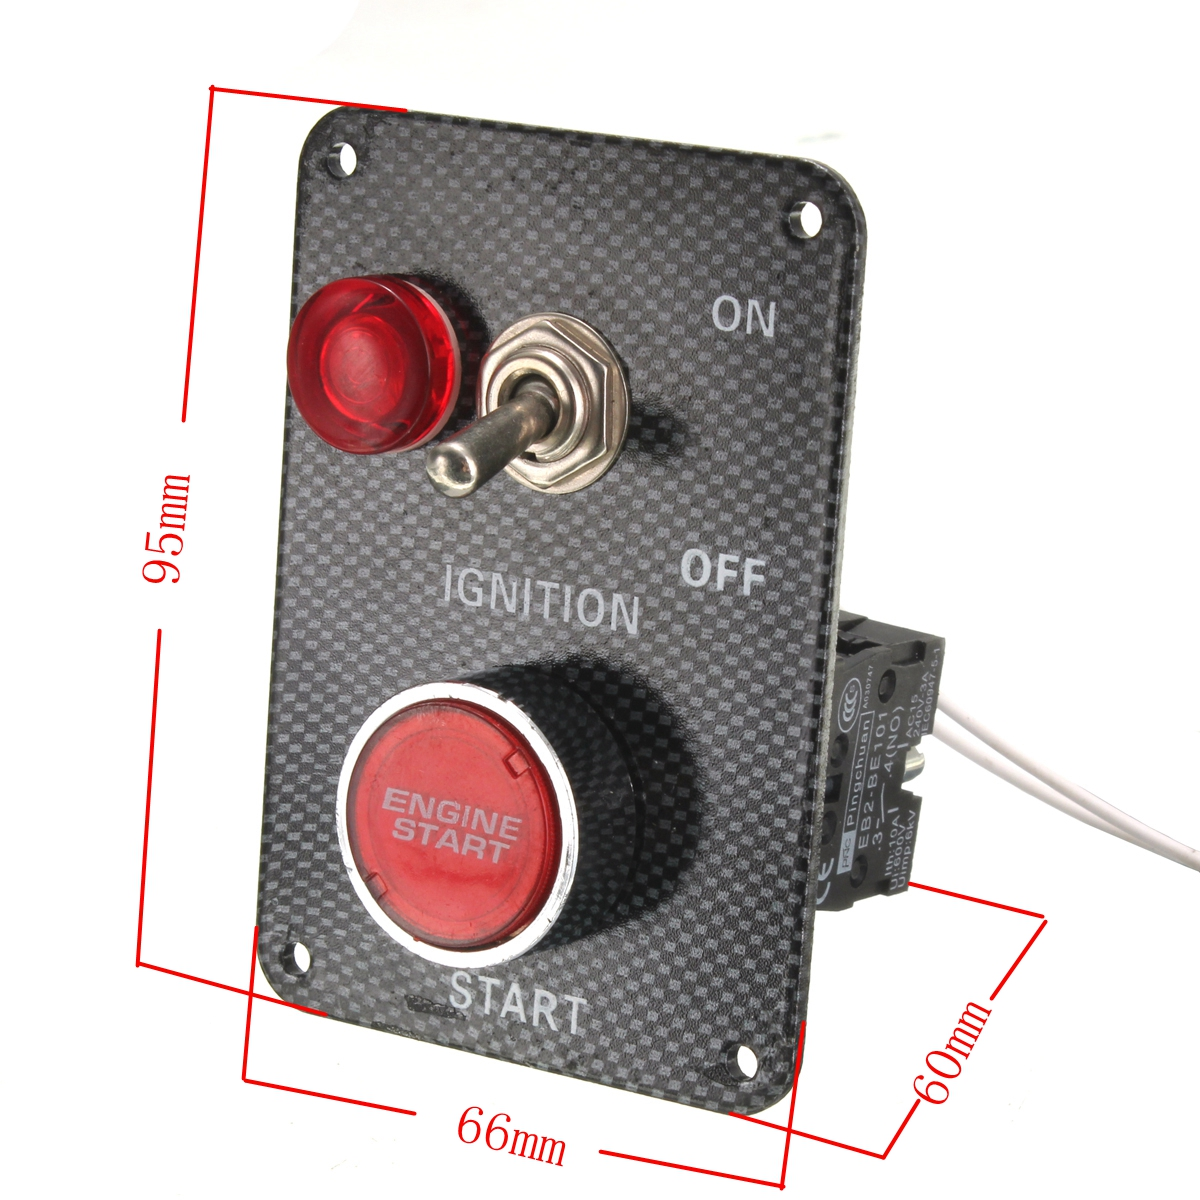 Toggle Switch Wiring Diagram On Illuminated Rocker Switch Wiring